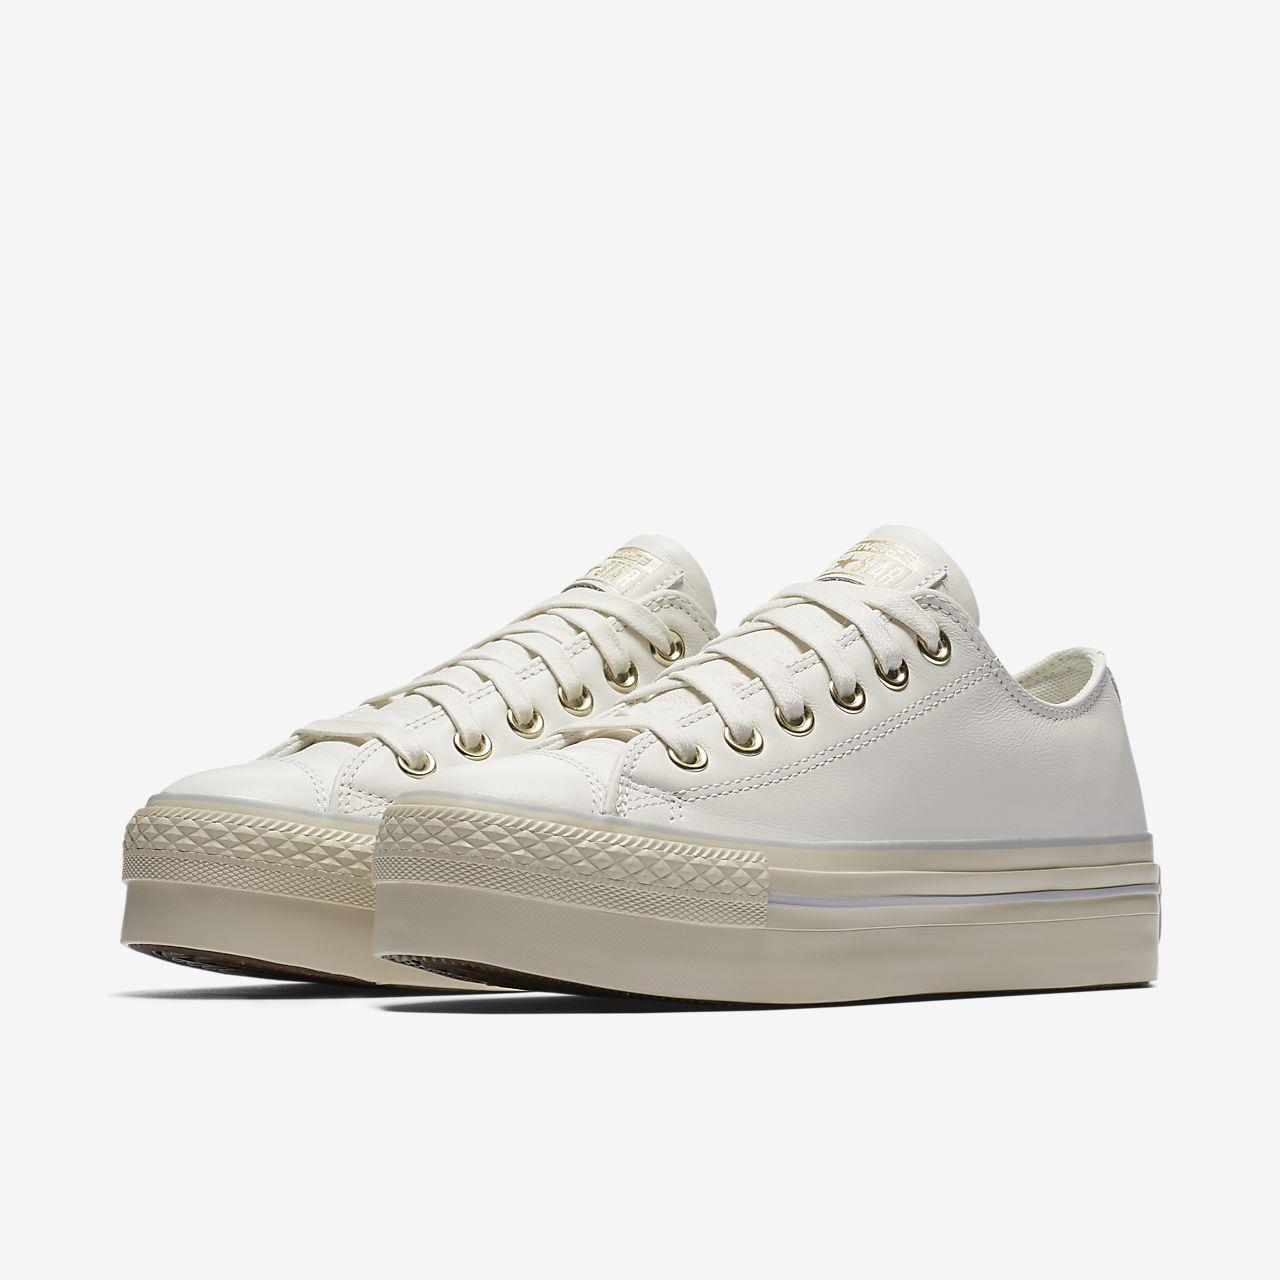 converse beige leather